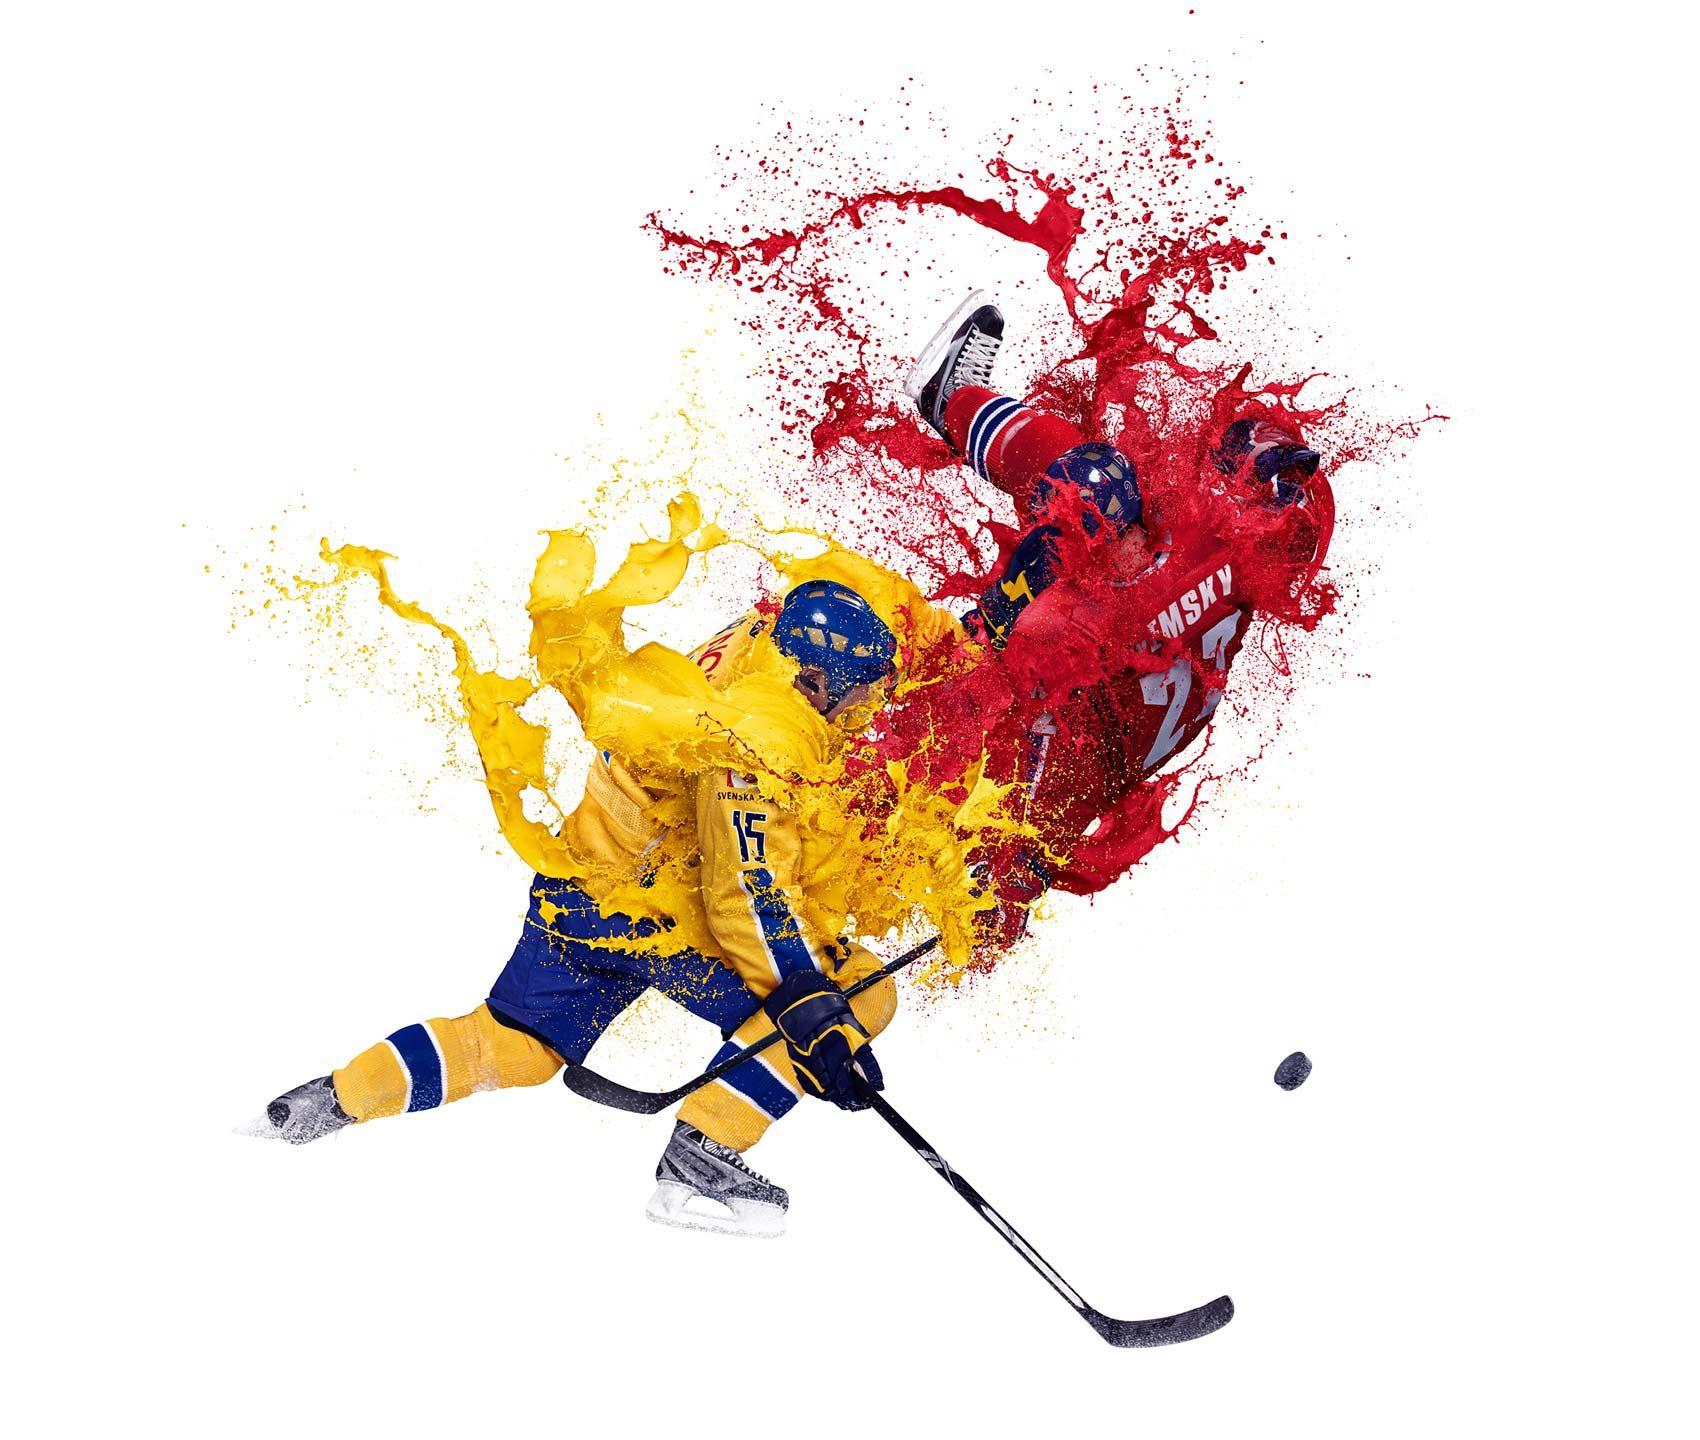 Iain Crawford Photographer Ice Hockey Cool Photos Smoke Painting